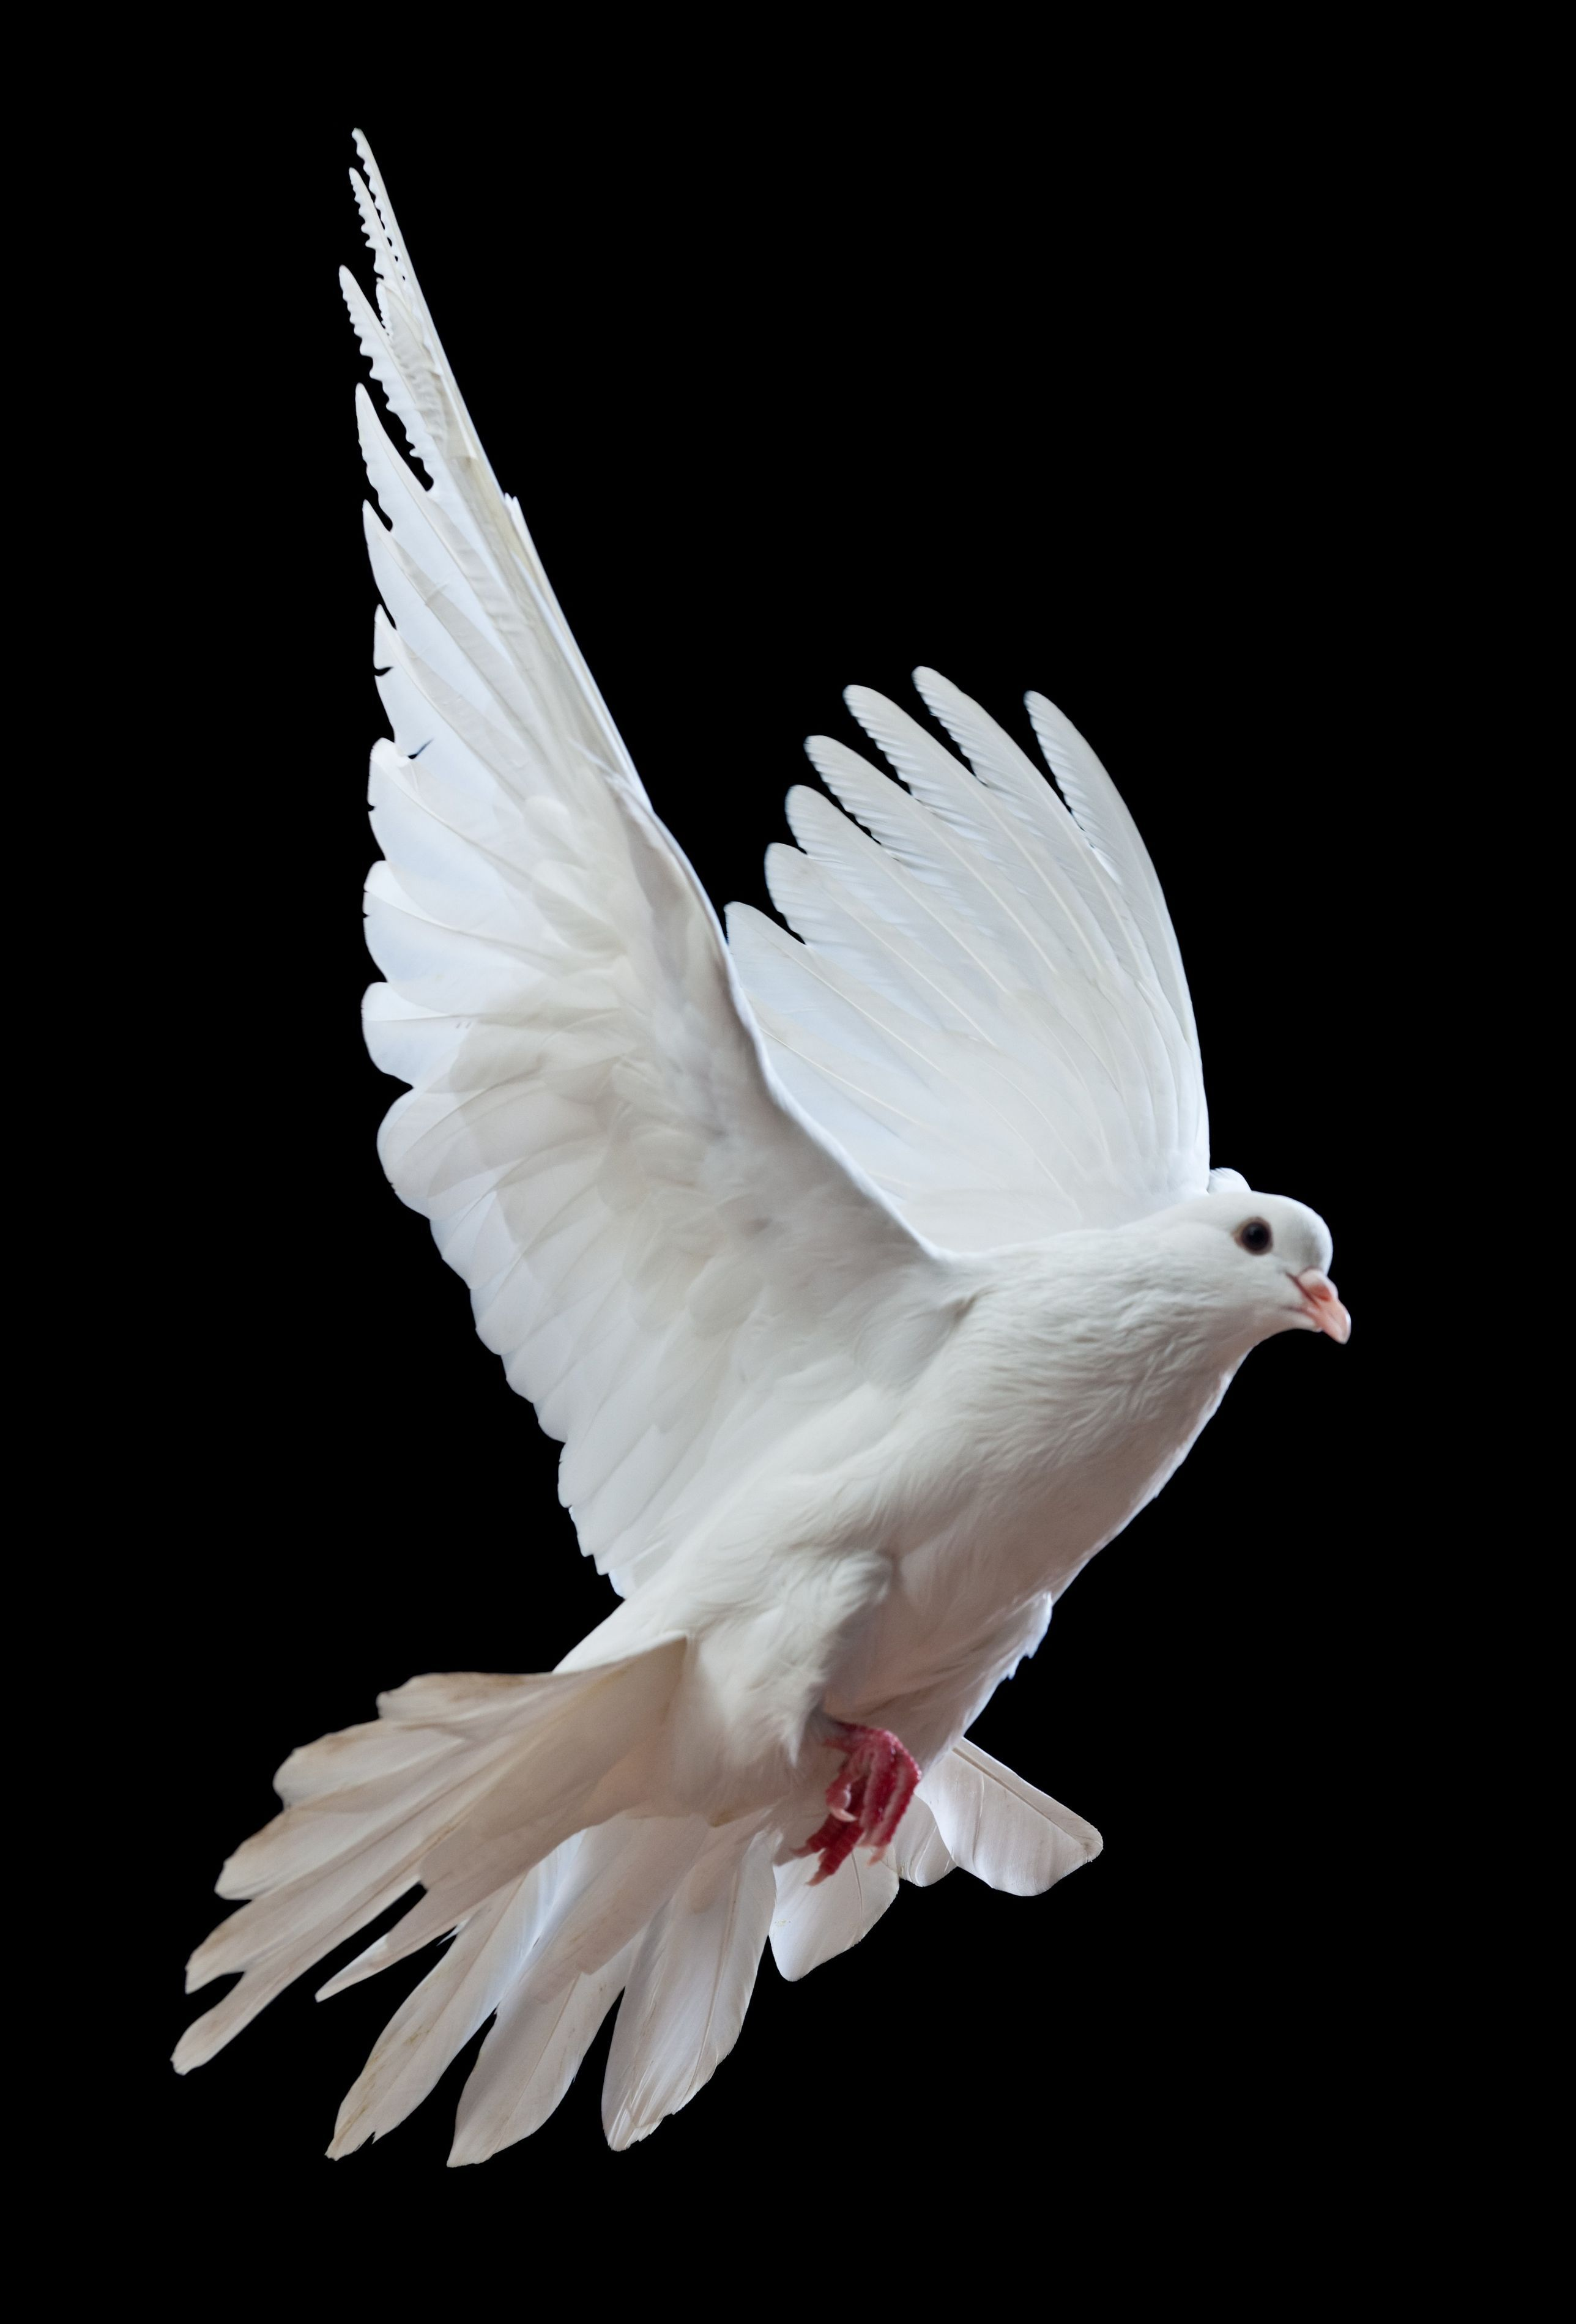 Photoshop Pro Create A Spirit Dove Effect Dove Images Dove Pictures Blue Background Images